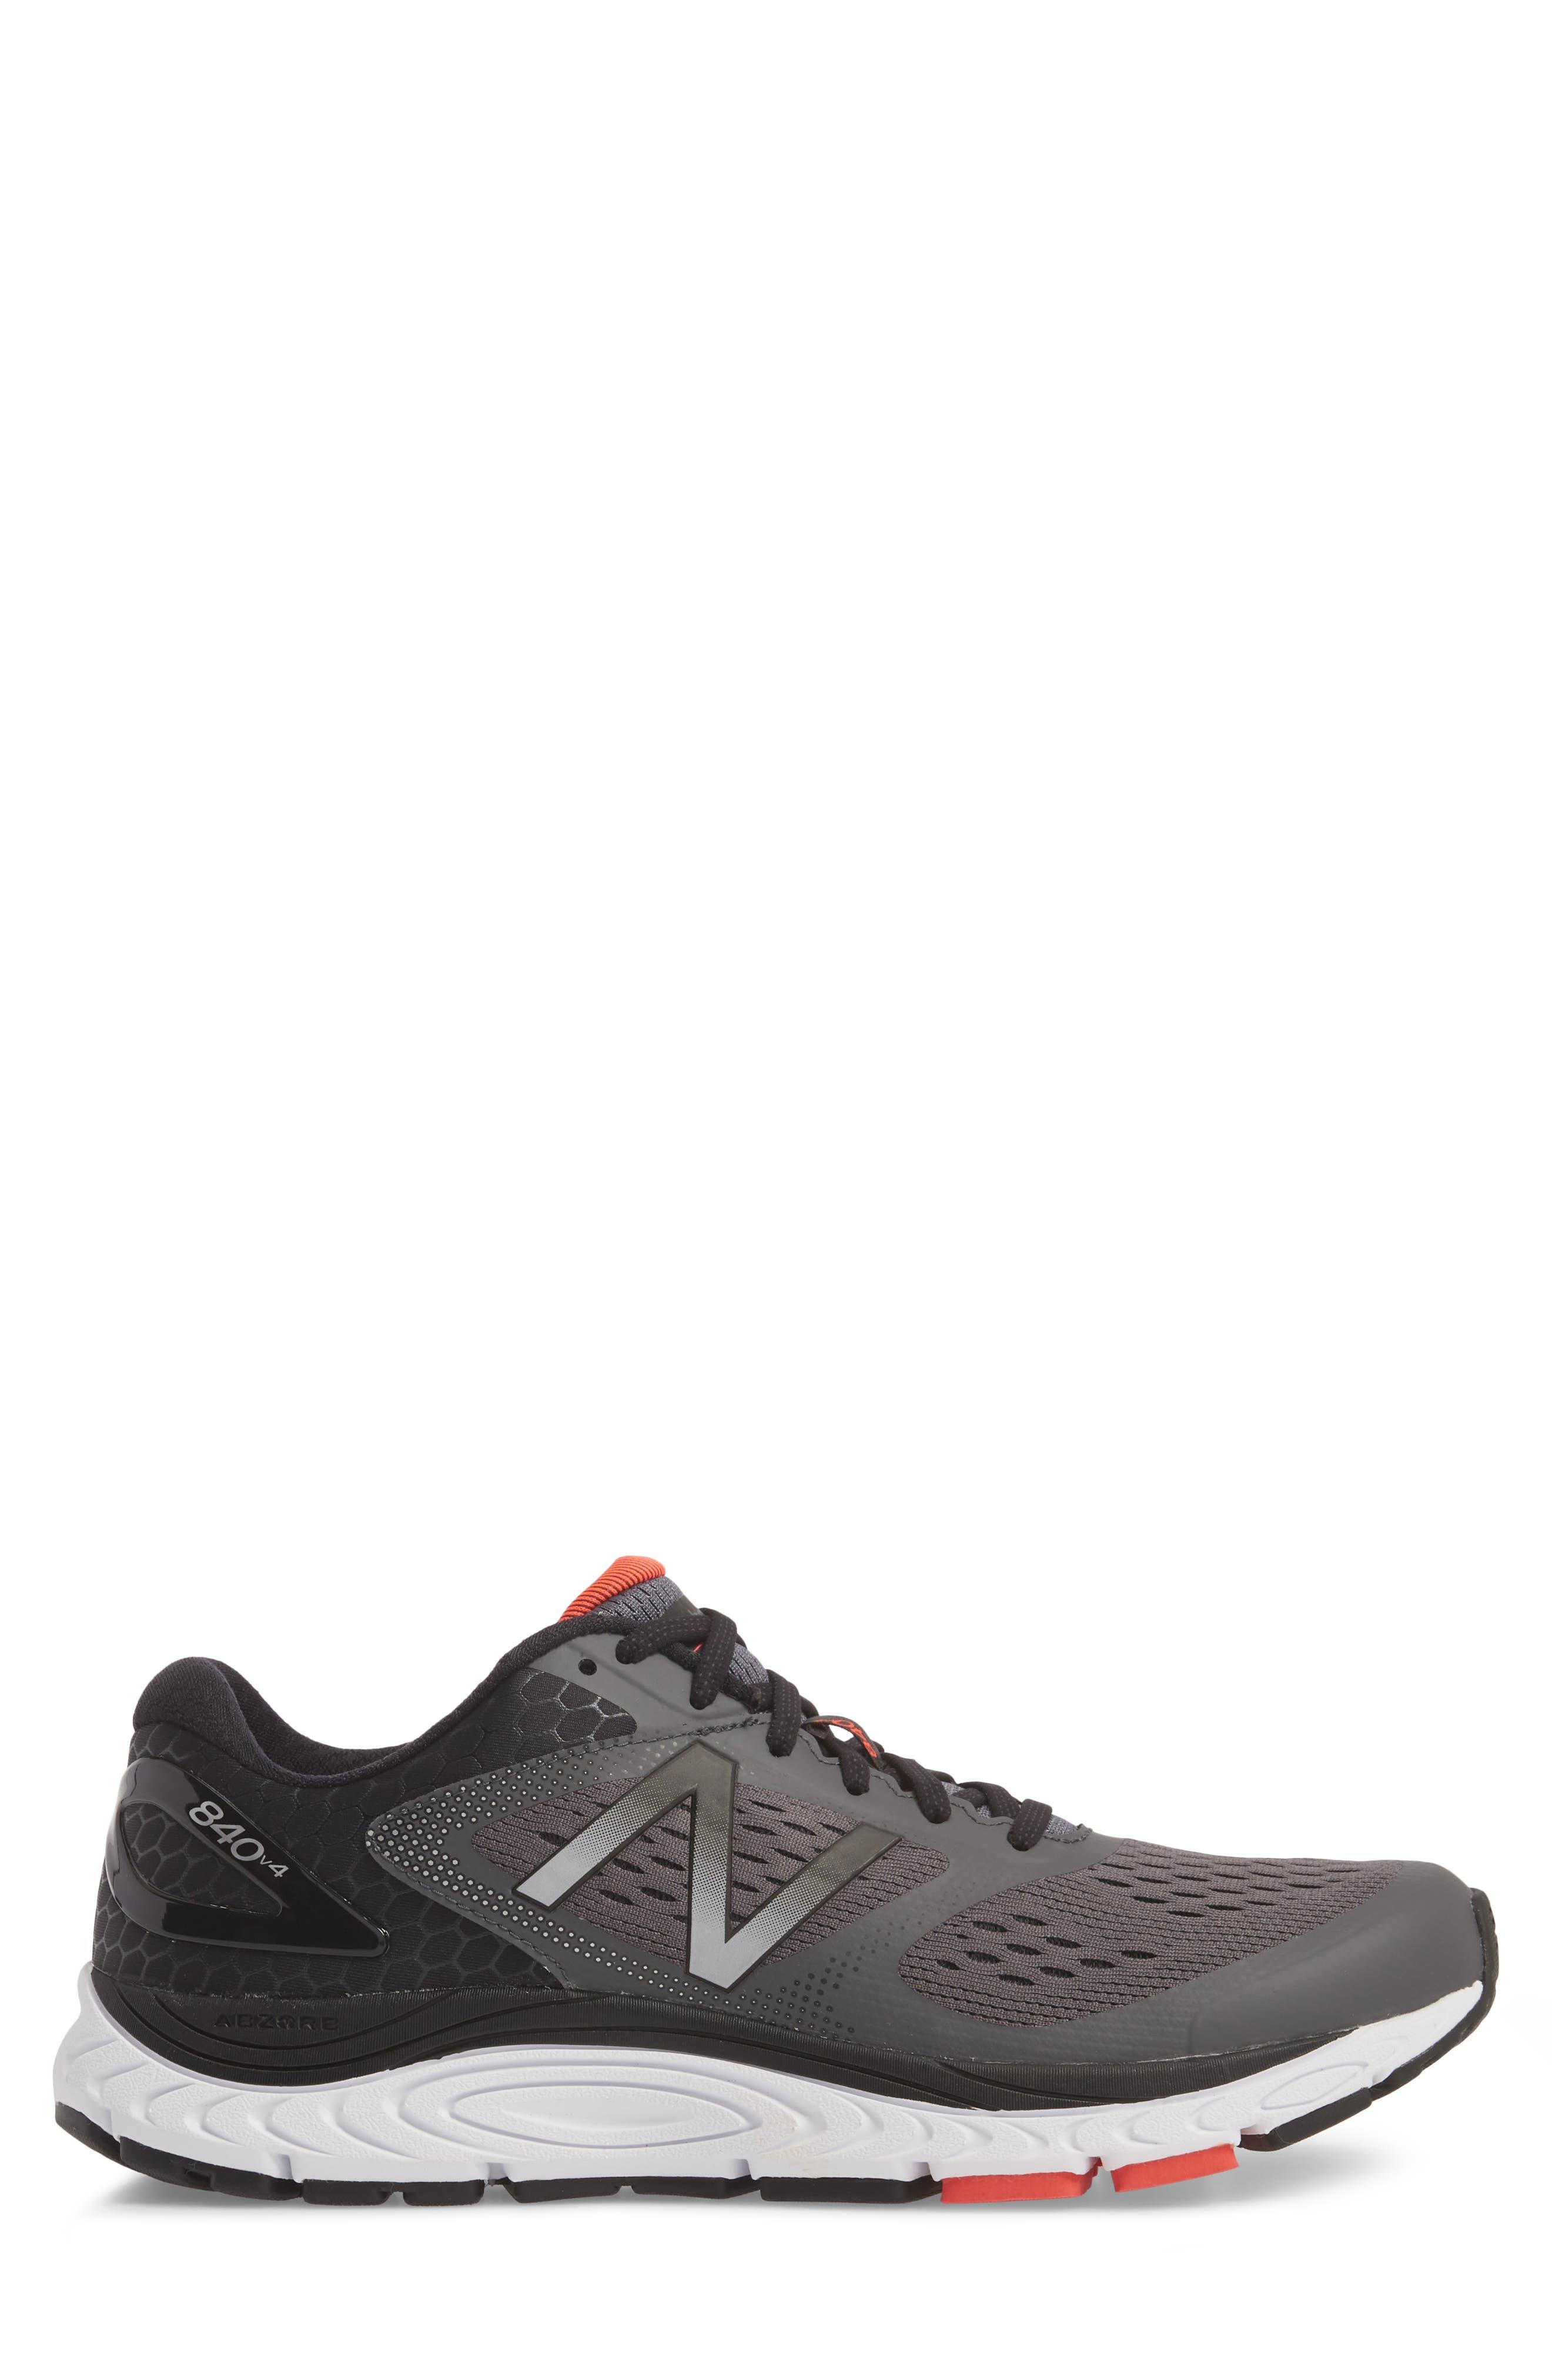 840v4 Running Shoe,                             Alternate thumbnail 4, color,                             Dark Grey